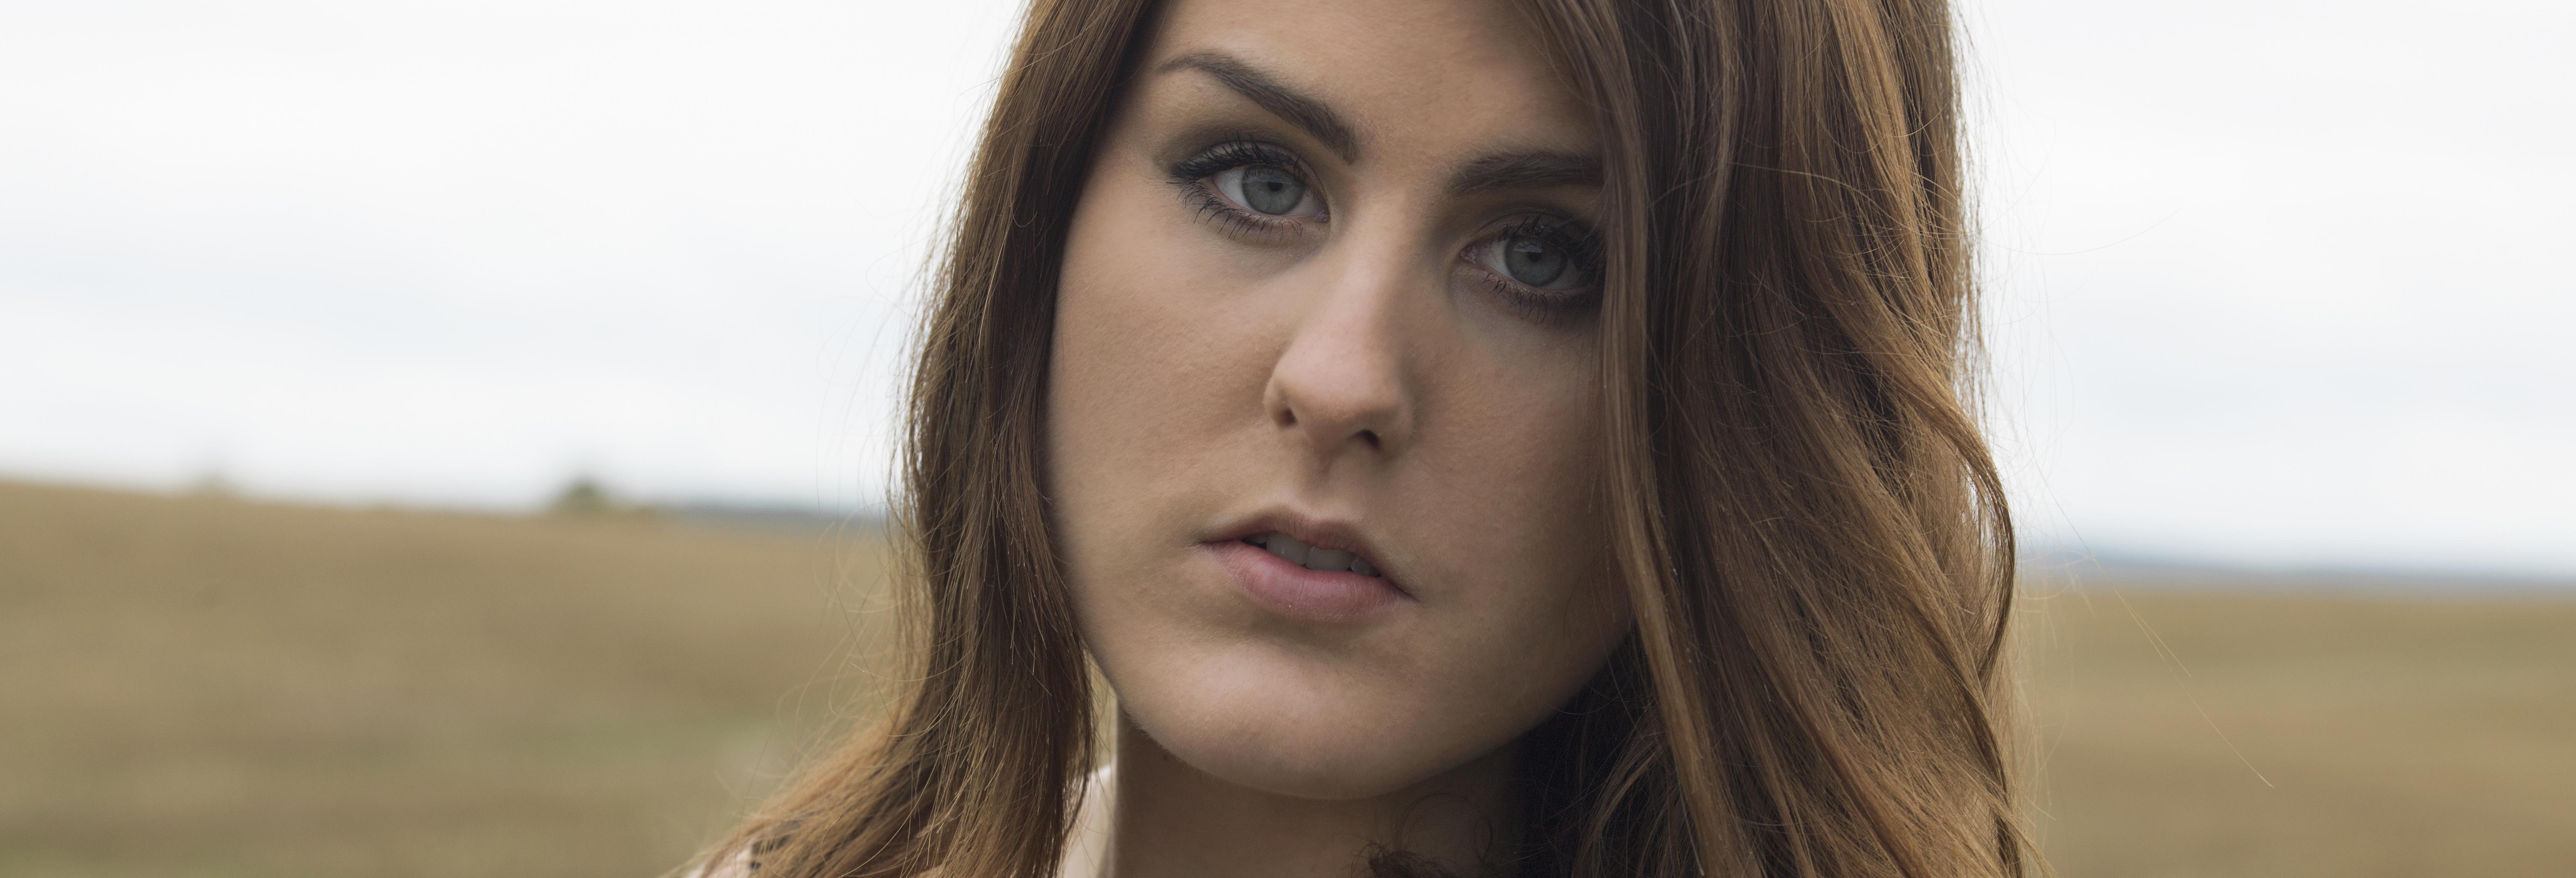 Michelle Aavitsland